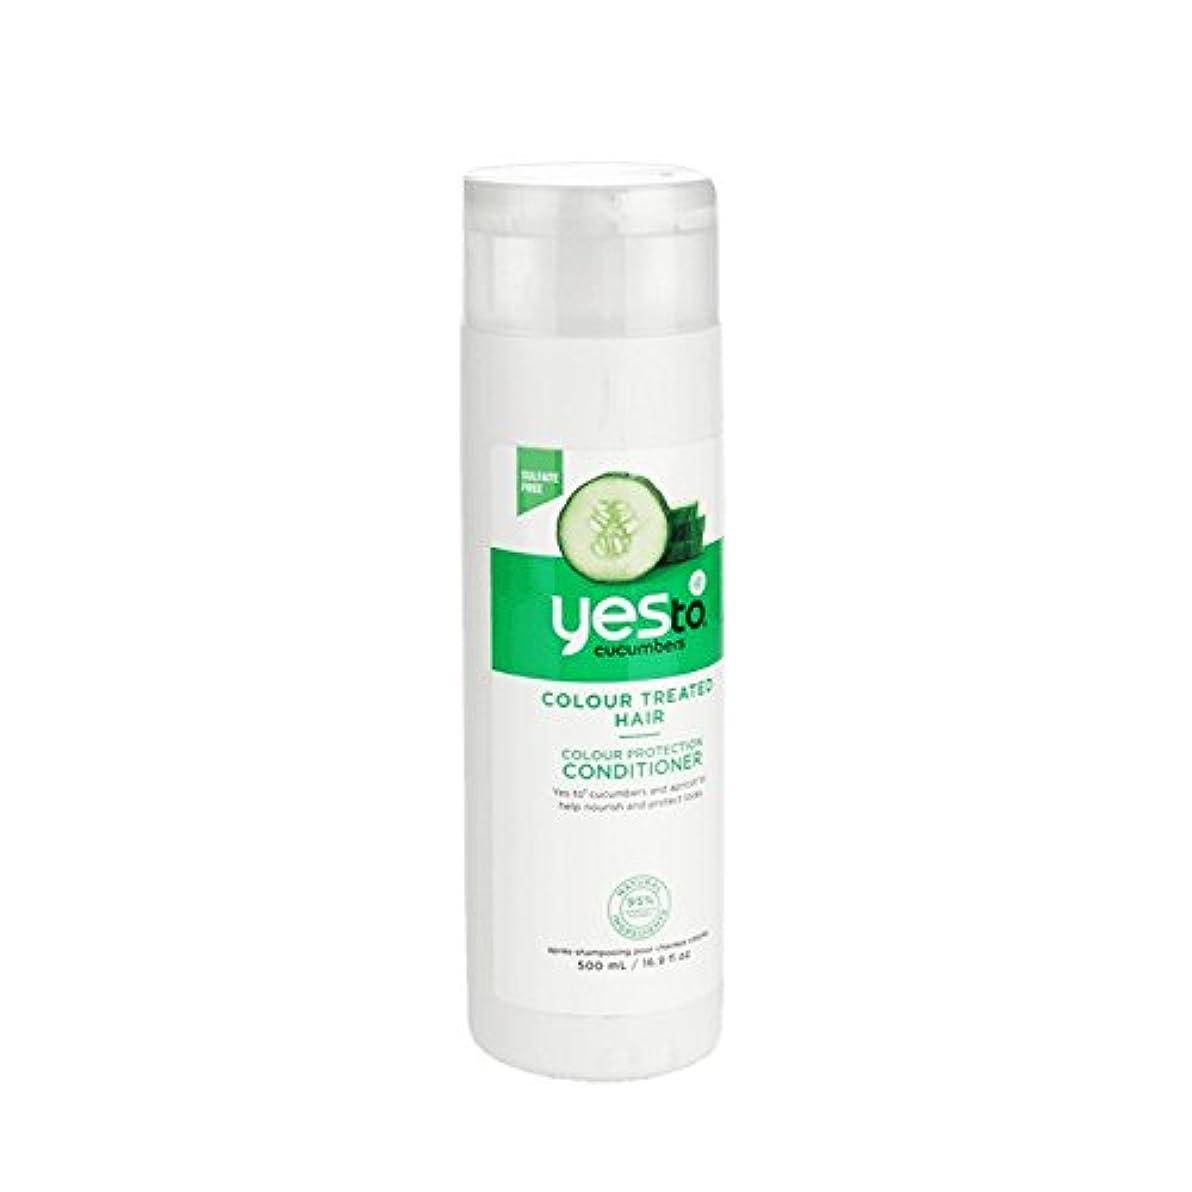 Yes To Cucumbers Colour Protection Conditioner 500ml (Pack of 6) - はいキュウリの色の保護コンディショナー500ミリリットルへ (x6) [並行輸入品]